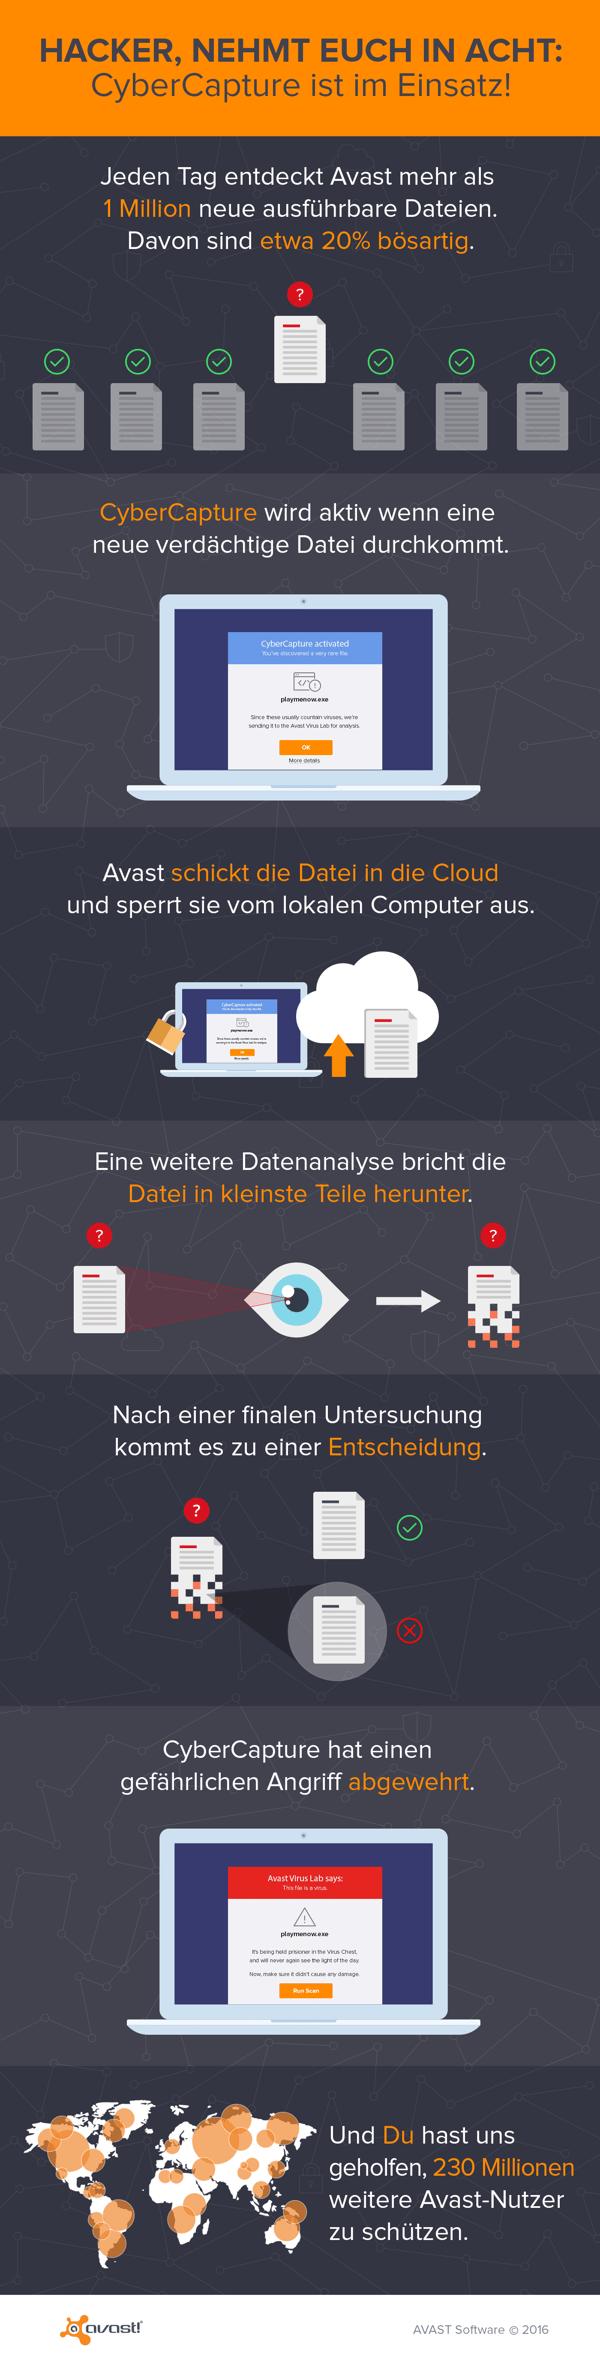 nitro_cyber_capture_infographics_German.png